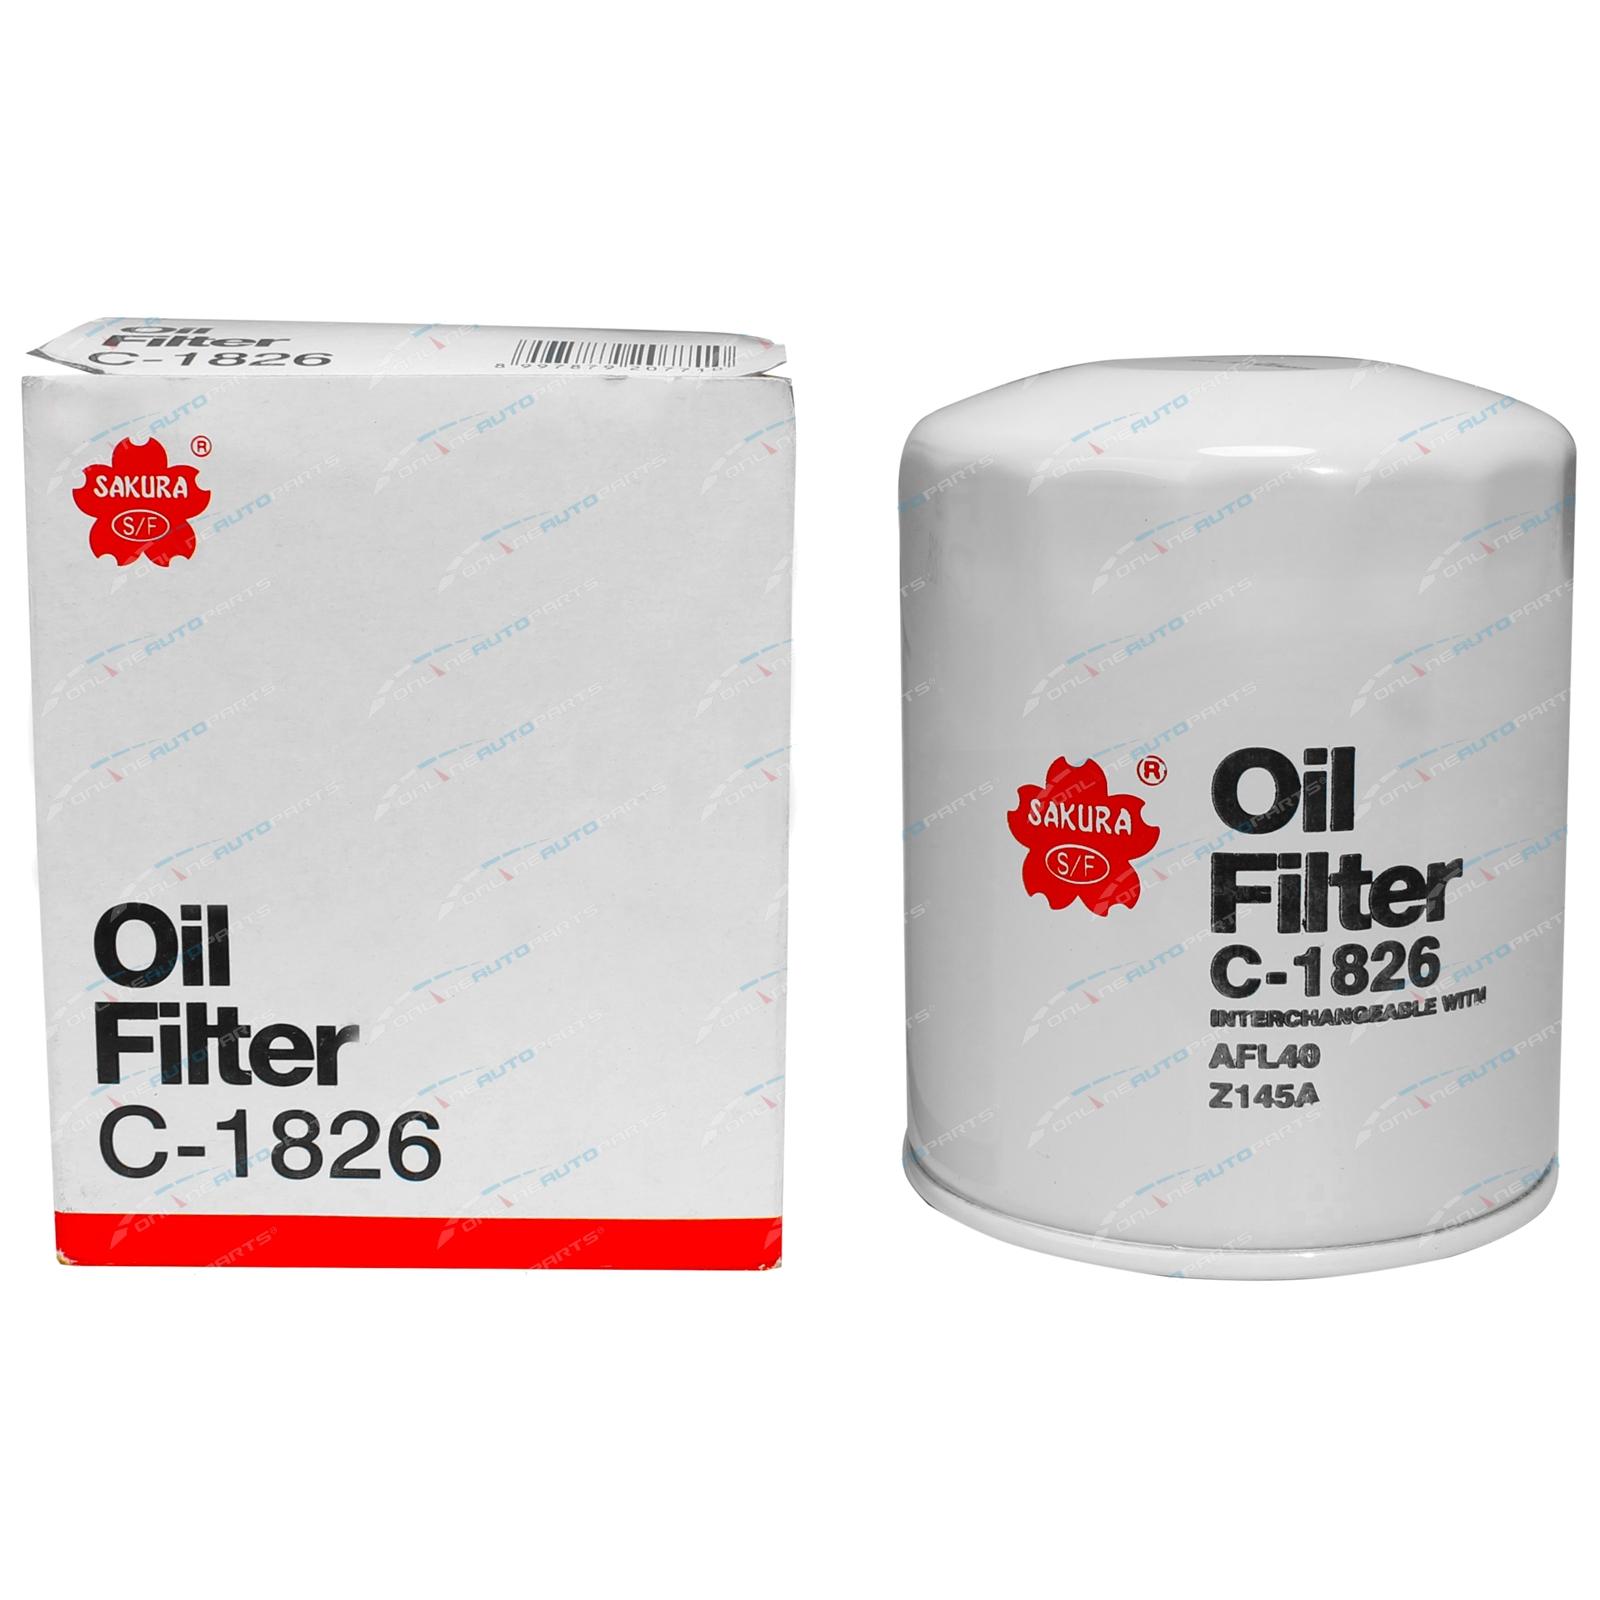 Sakura Engine Oil Filter suits Nissan Cabstar F22 H40 4cyl